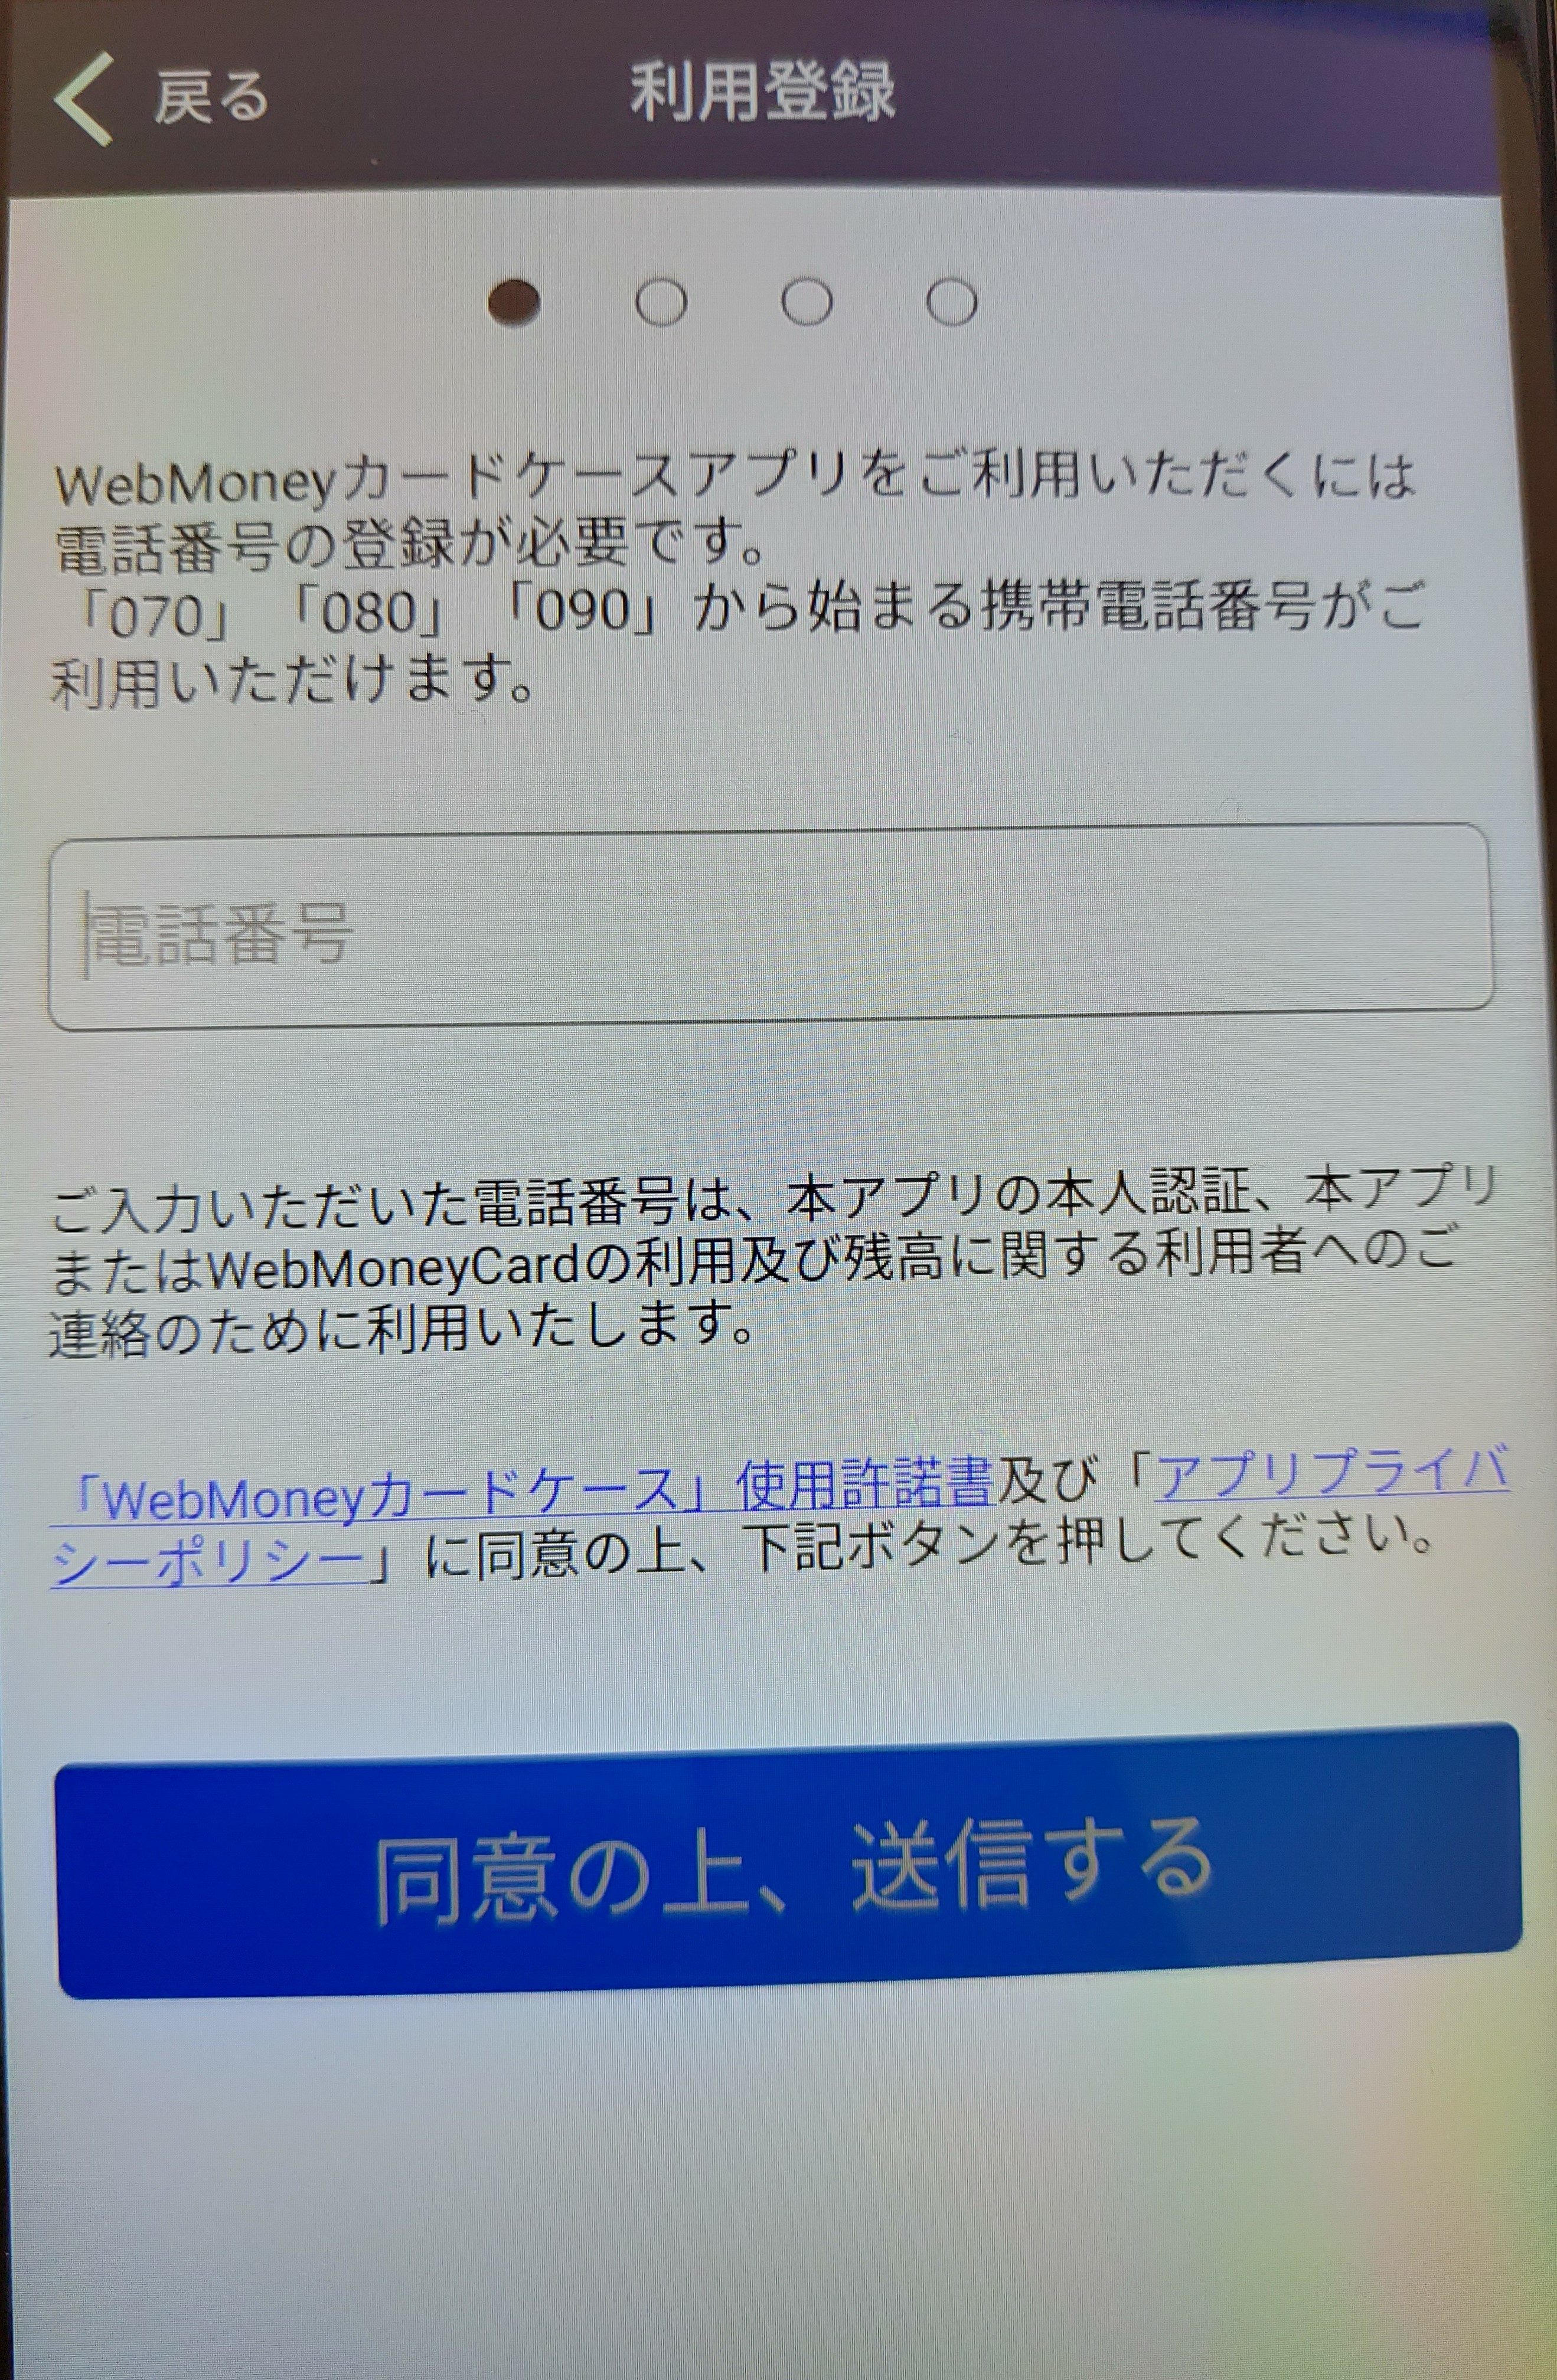 WebMoneyカードケースアプリ利用登録電話番号入力画面